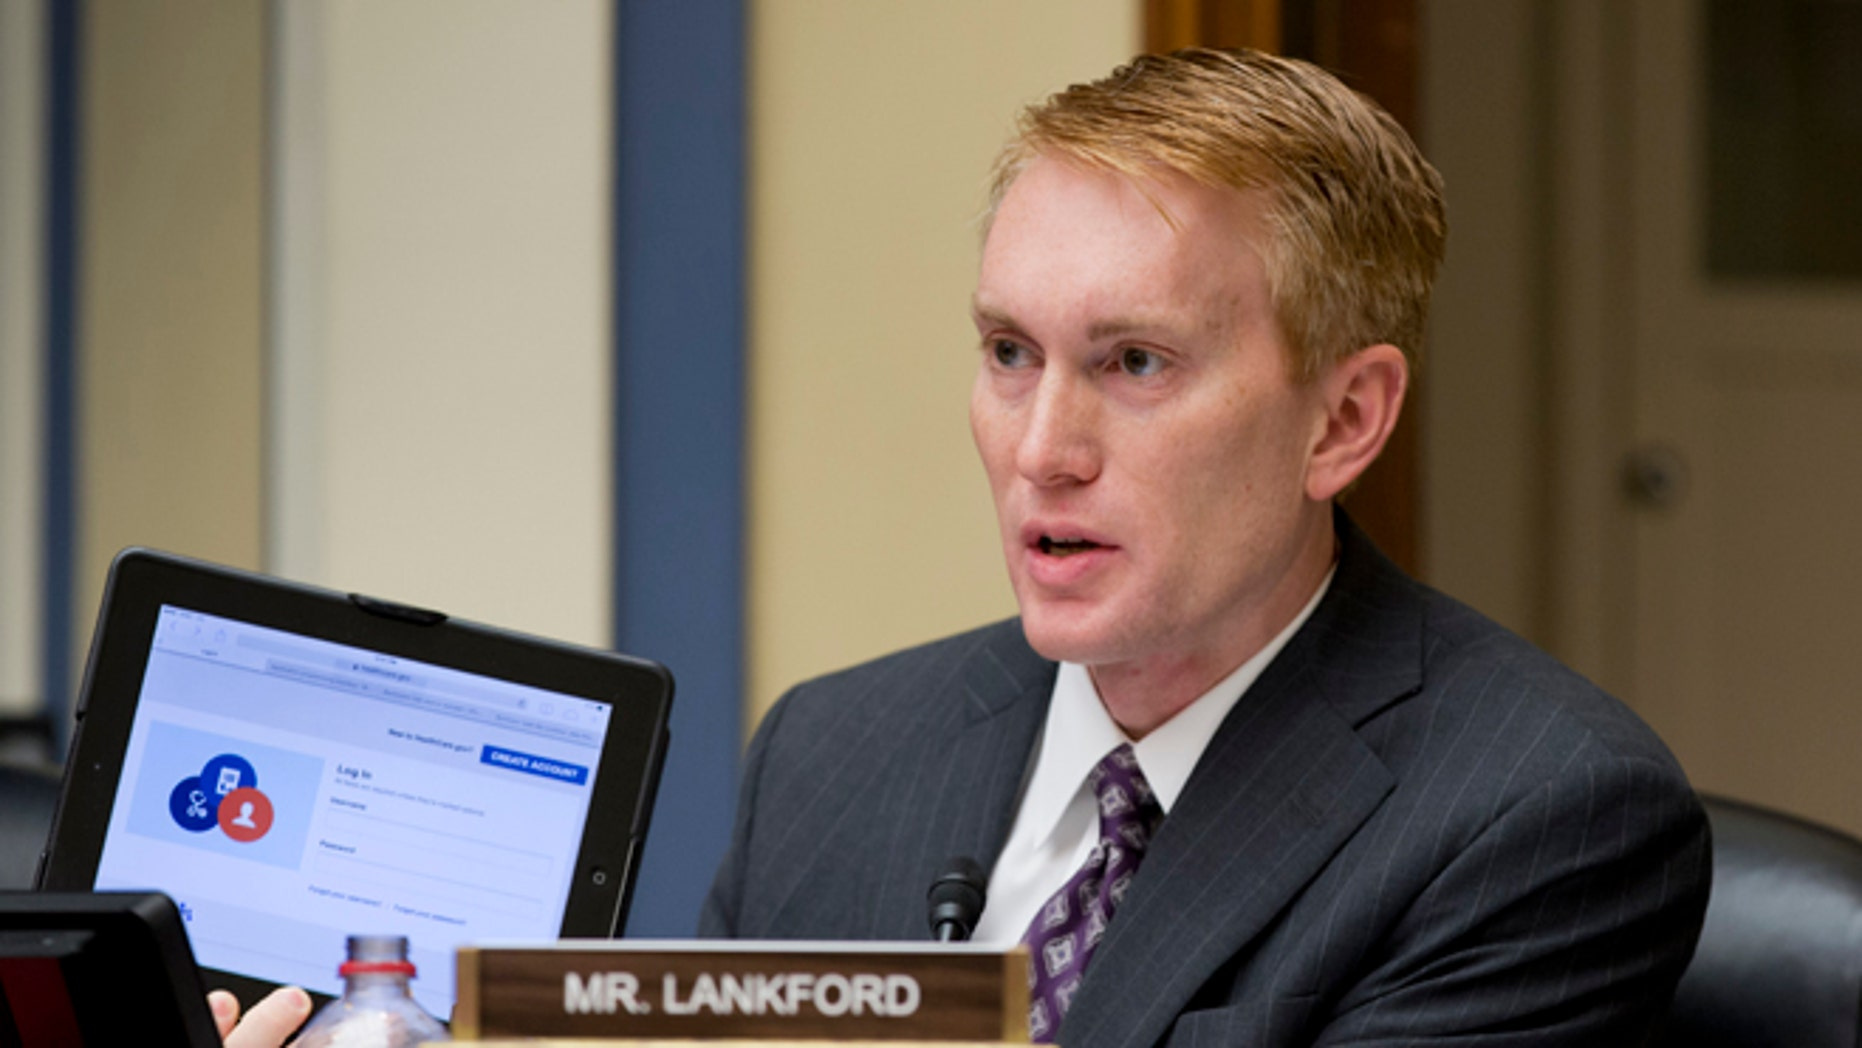 FILE: Nov. 13, 2013: Rep. James Lankford, R-Okla., on Capitol Hill, in Washington, D.C.